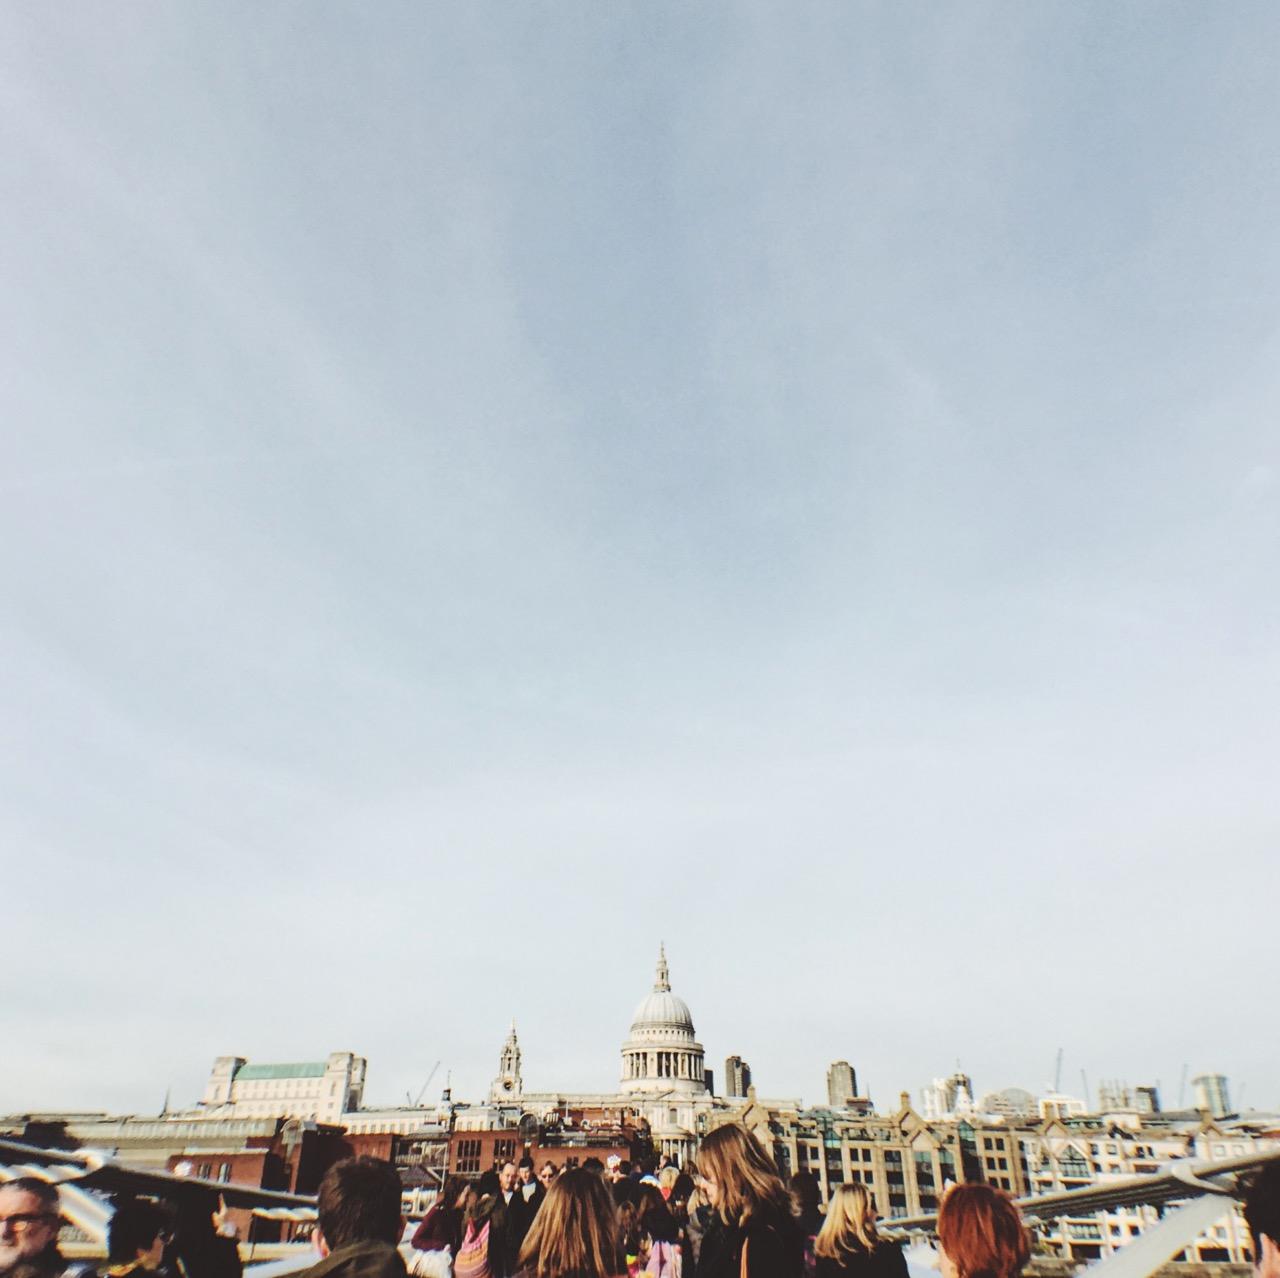 London-on-foot-Lorraine-Yeung-24.jpg